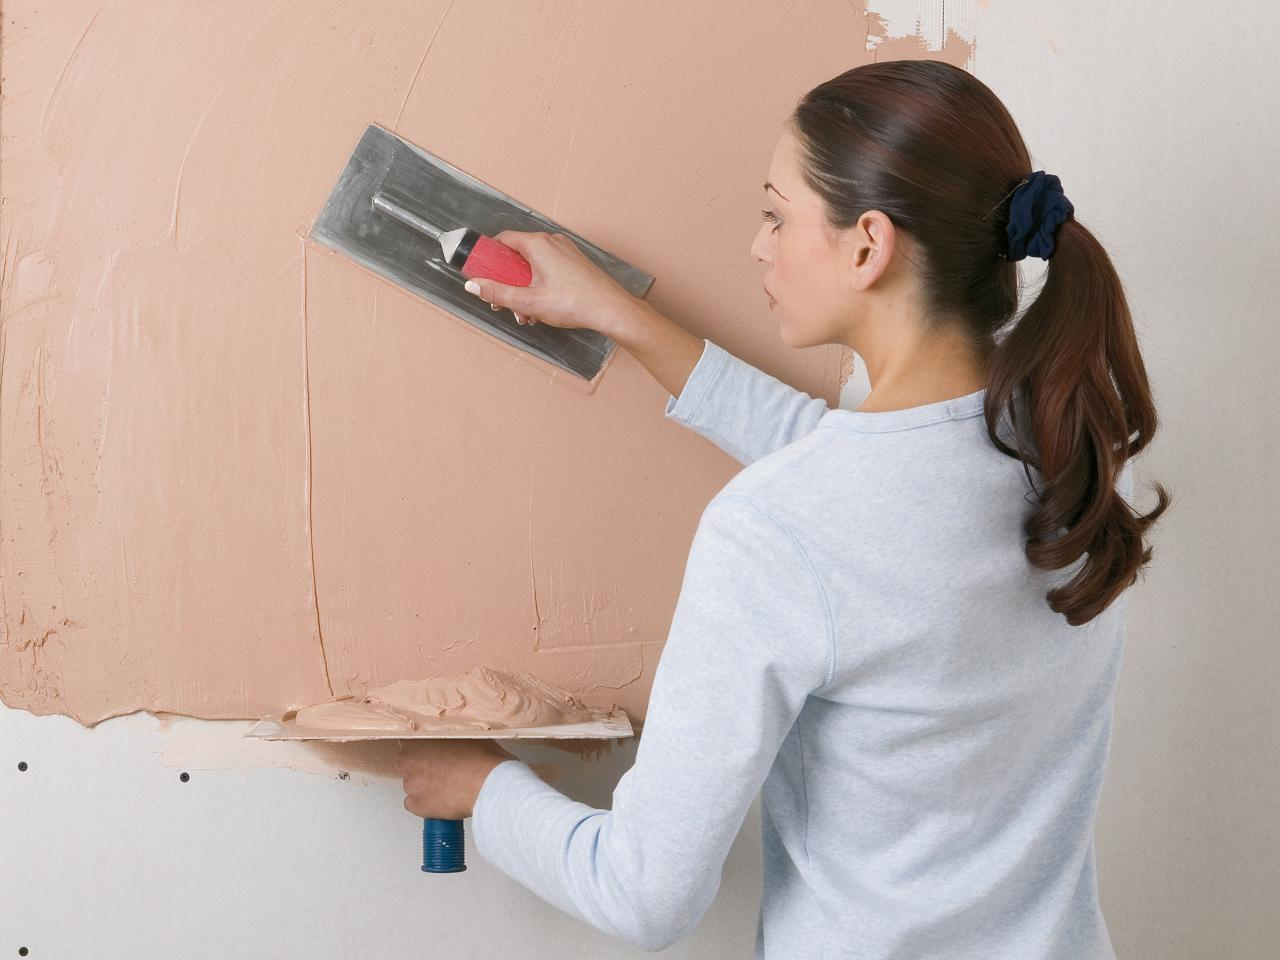 Шпаклевка гипсокартона под покраску